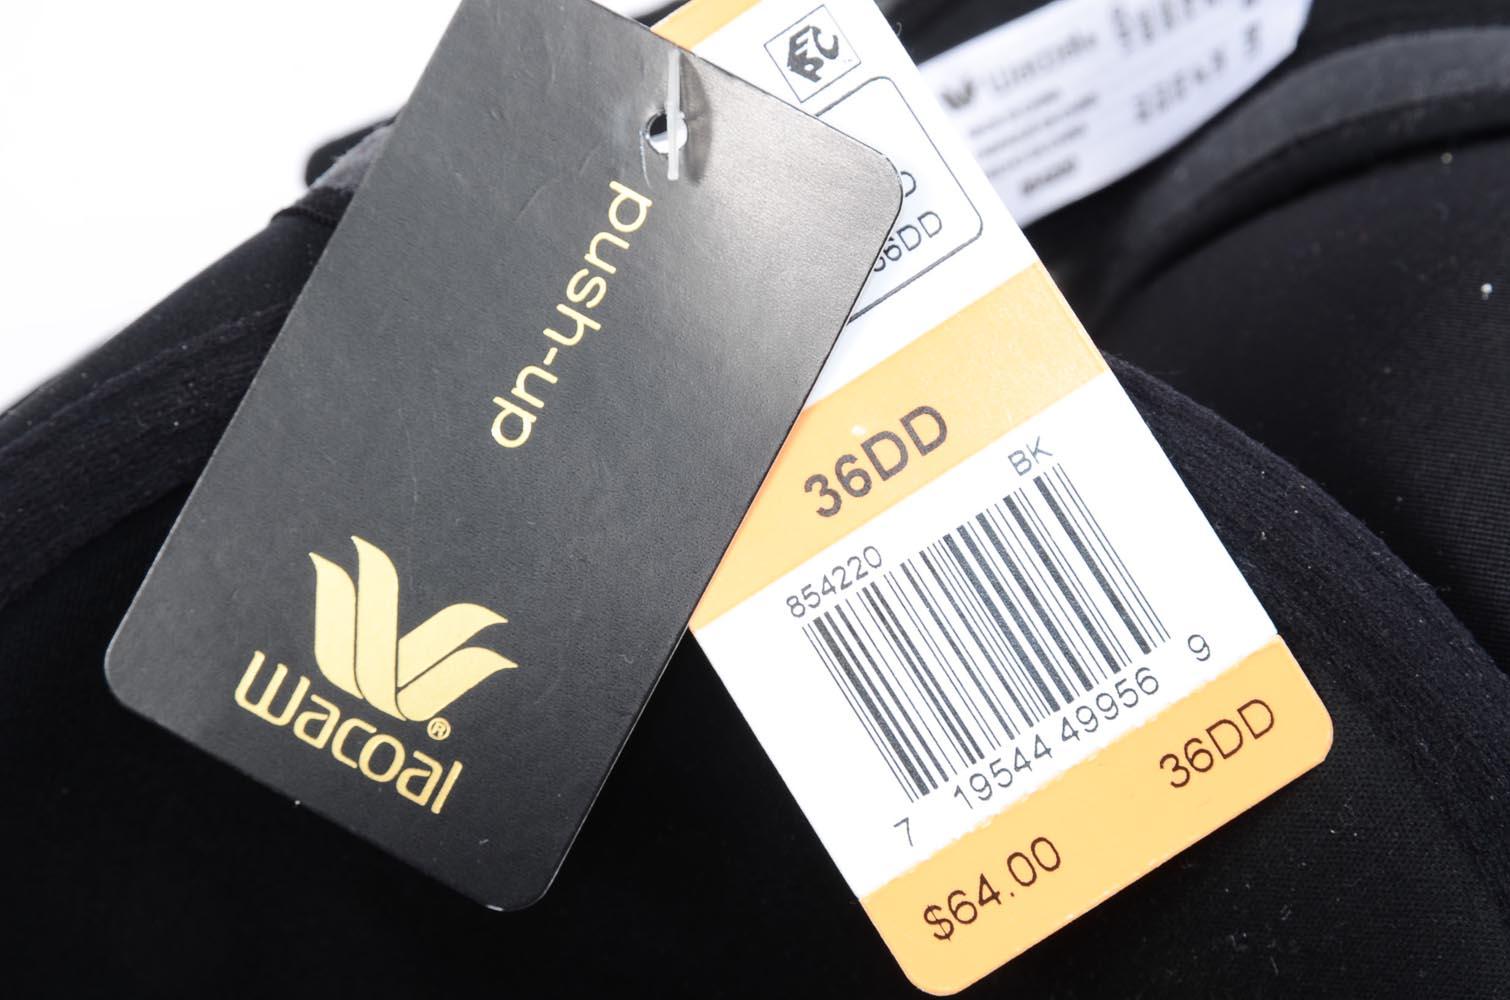 1b34e89953 Wacoal 854220 Amazing Assets black 36DD strapless underwire push-up bra NEW   64